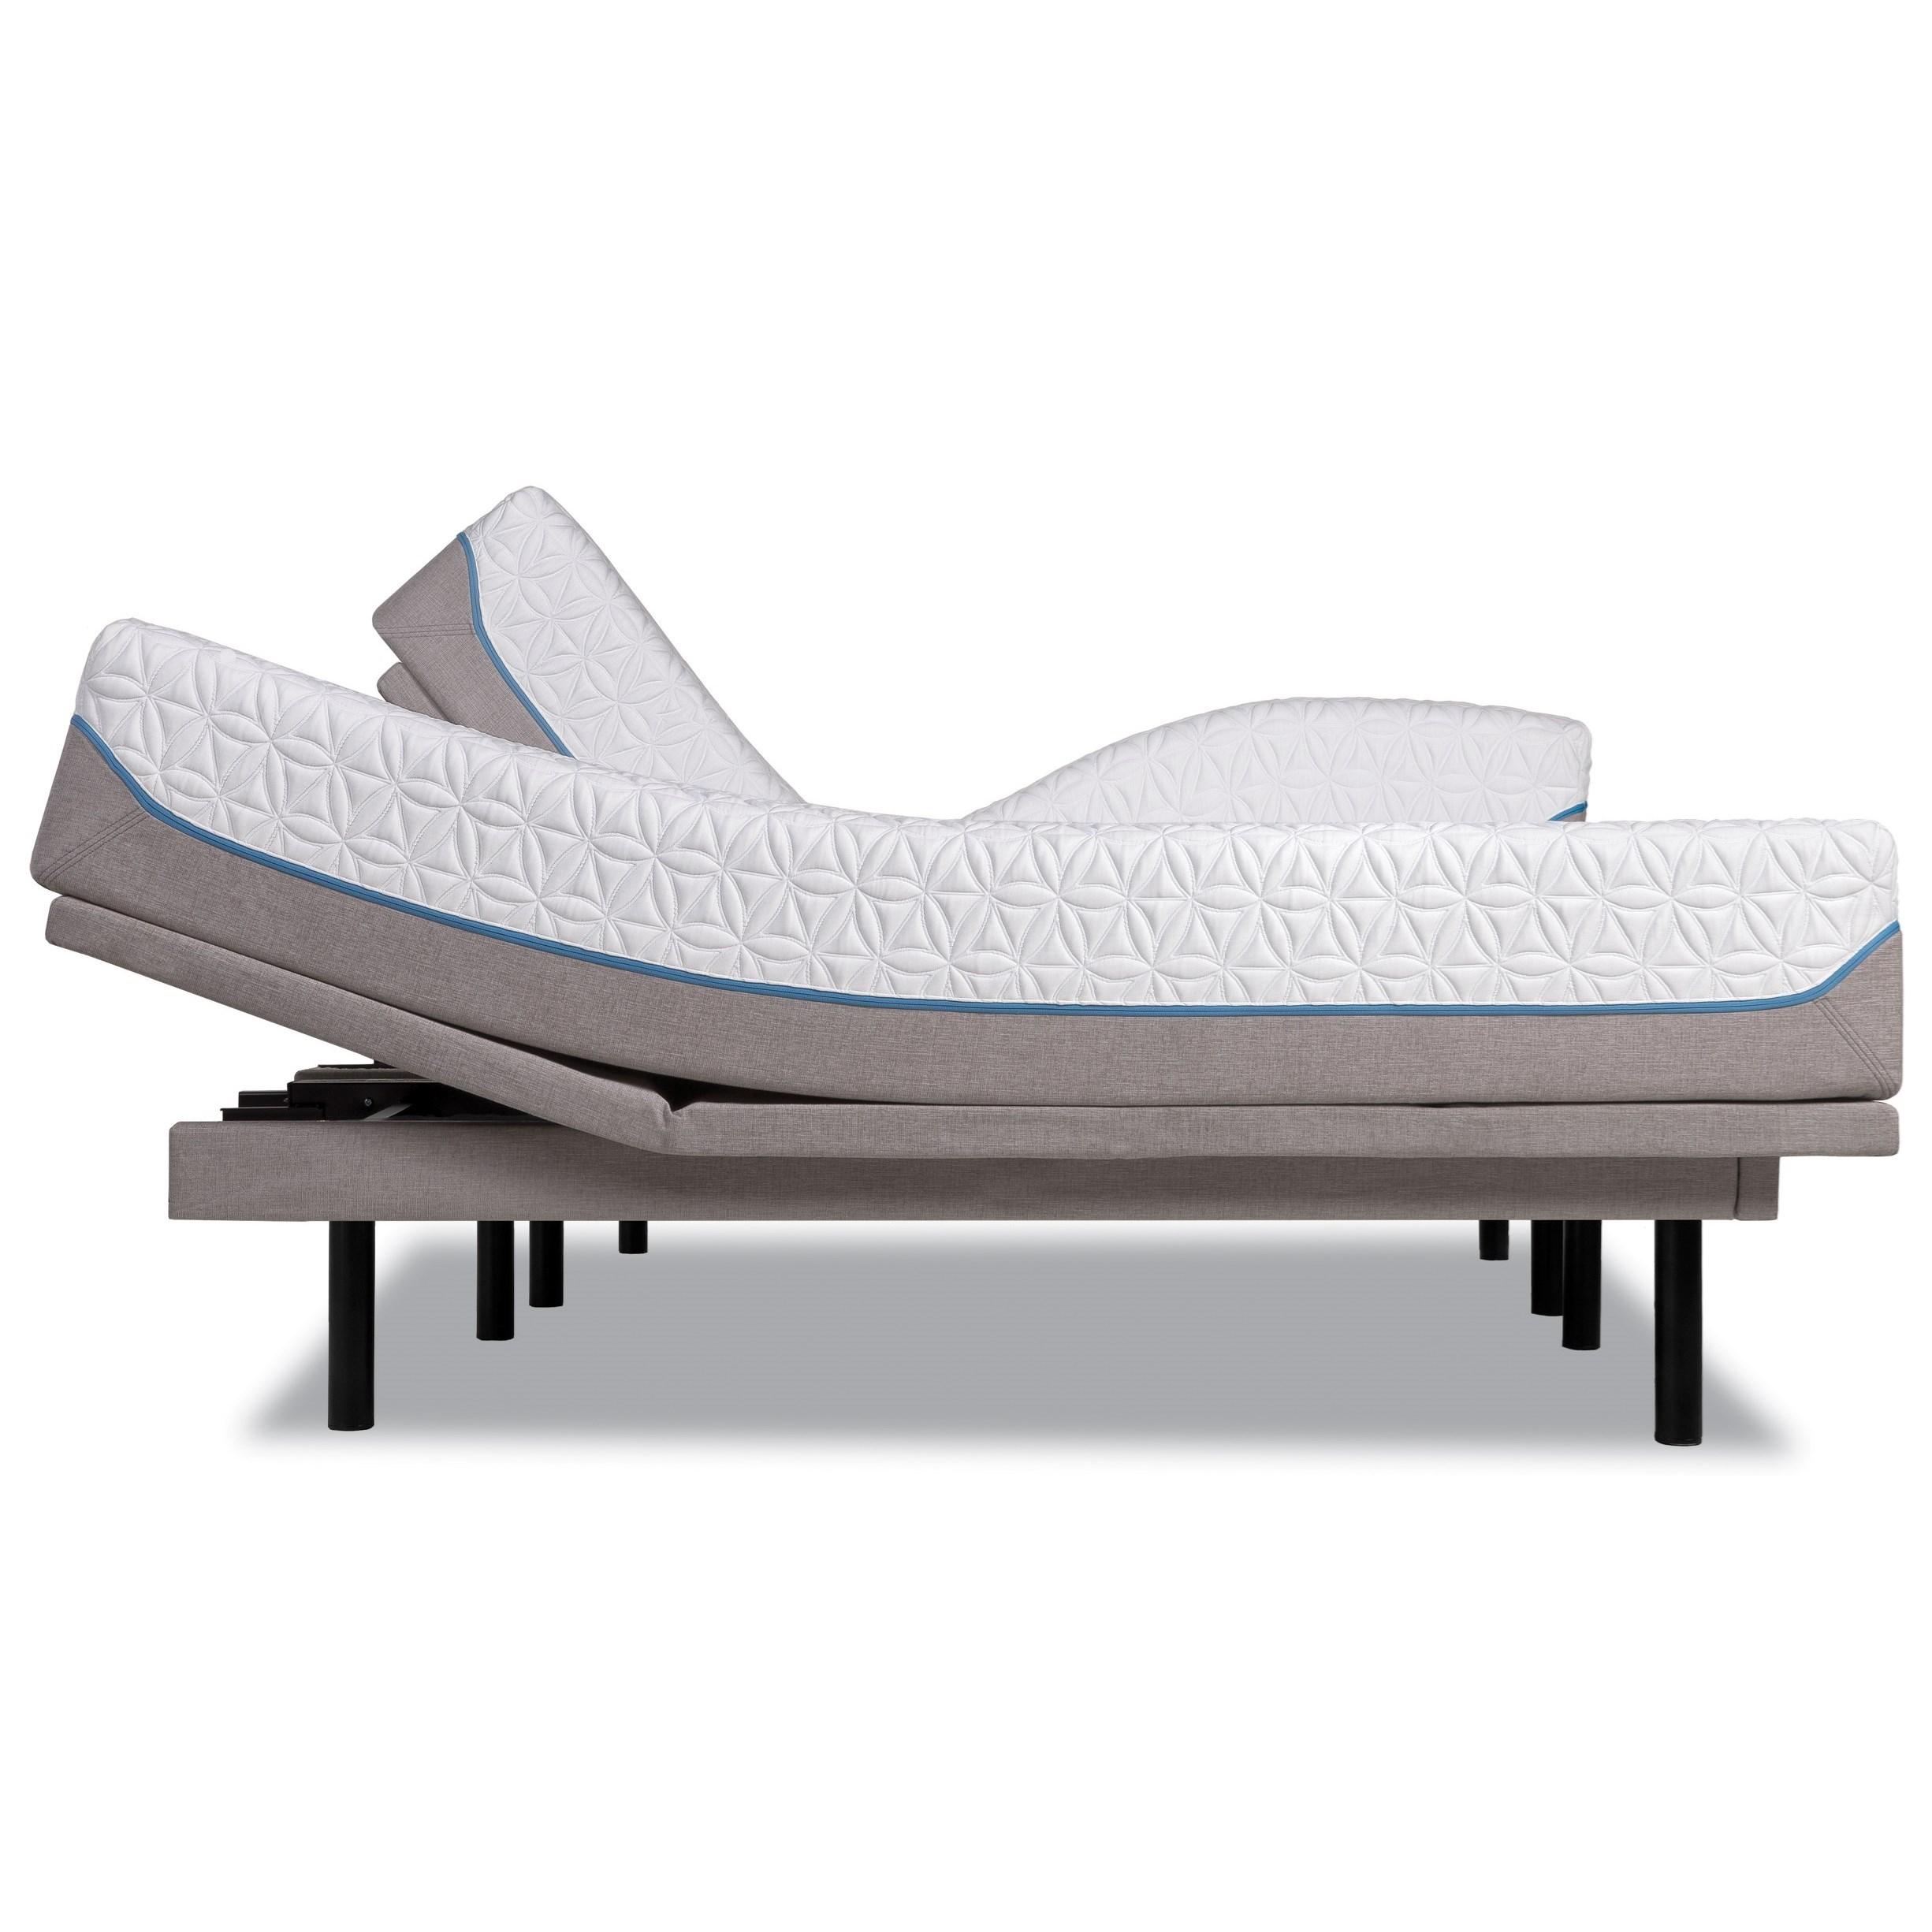 Tempur-Pedic® TEMPUR-Cloud Supreme Queen Soft Mattress Set - Item Number: 10240250+25289250